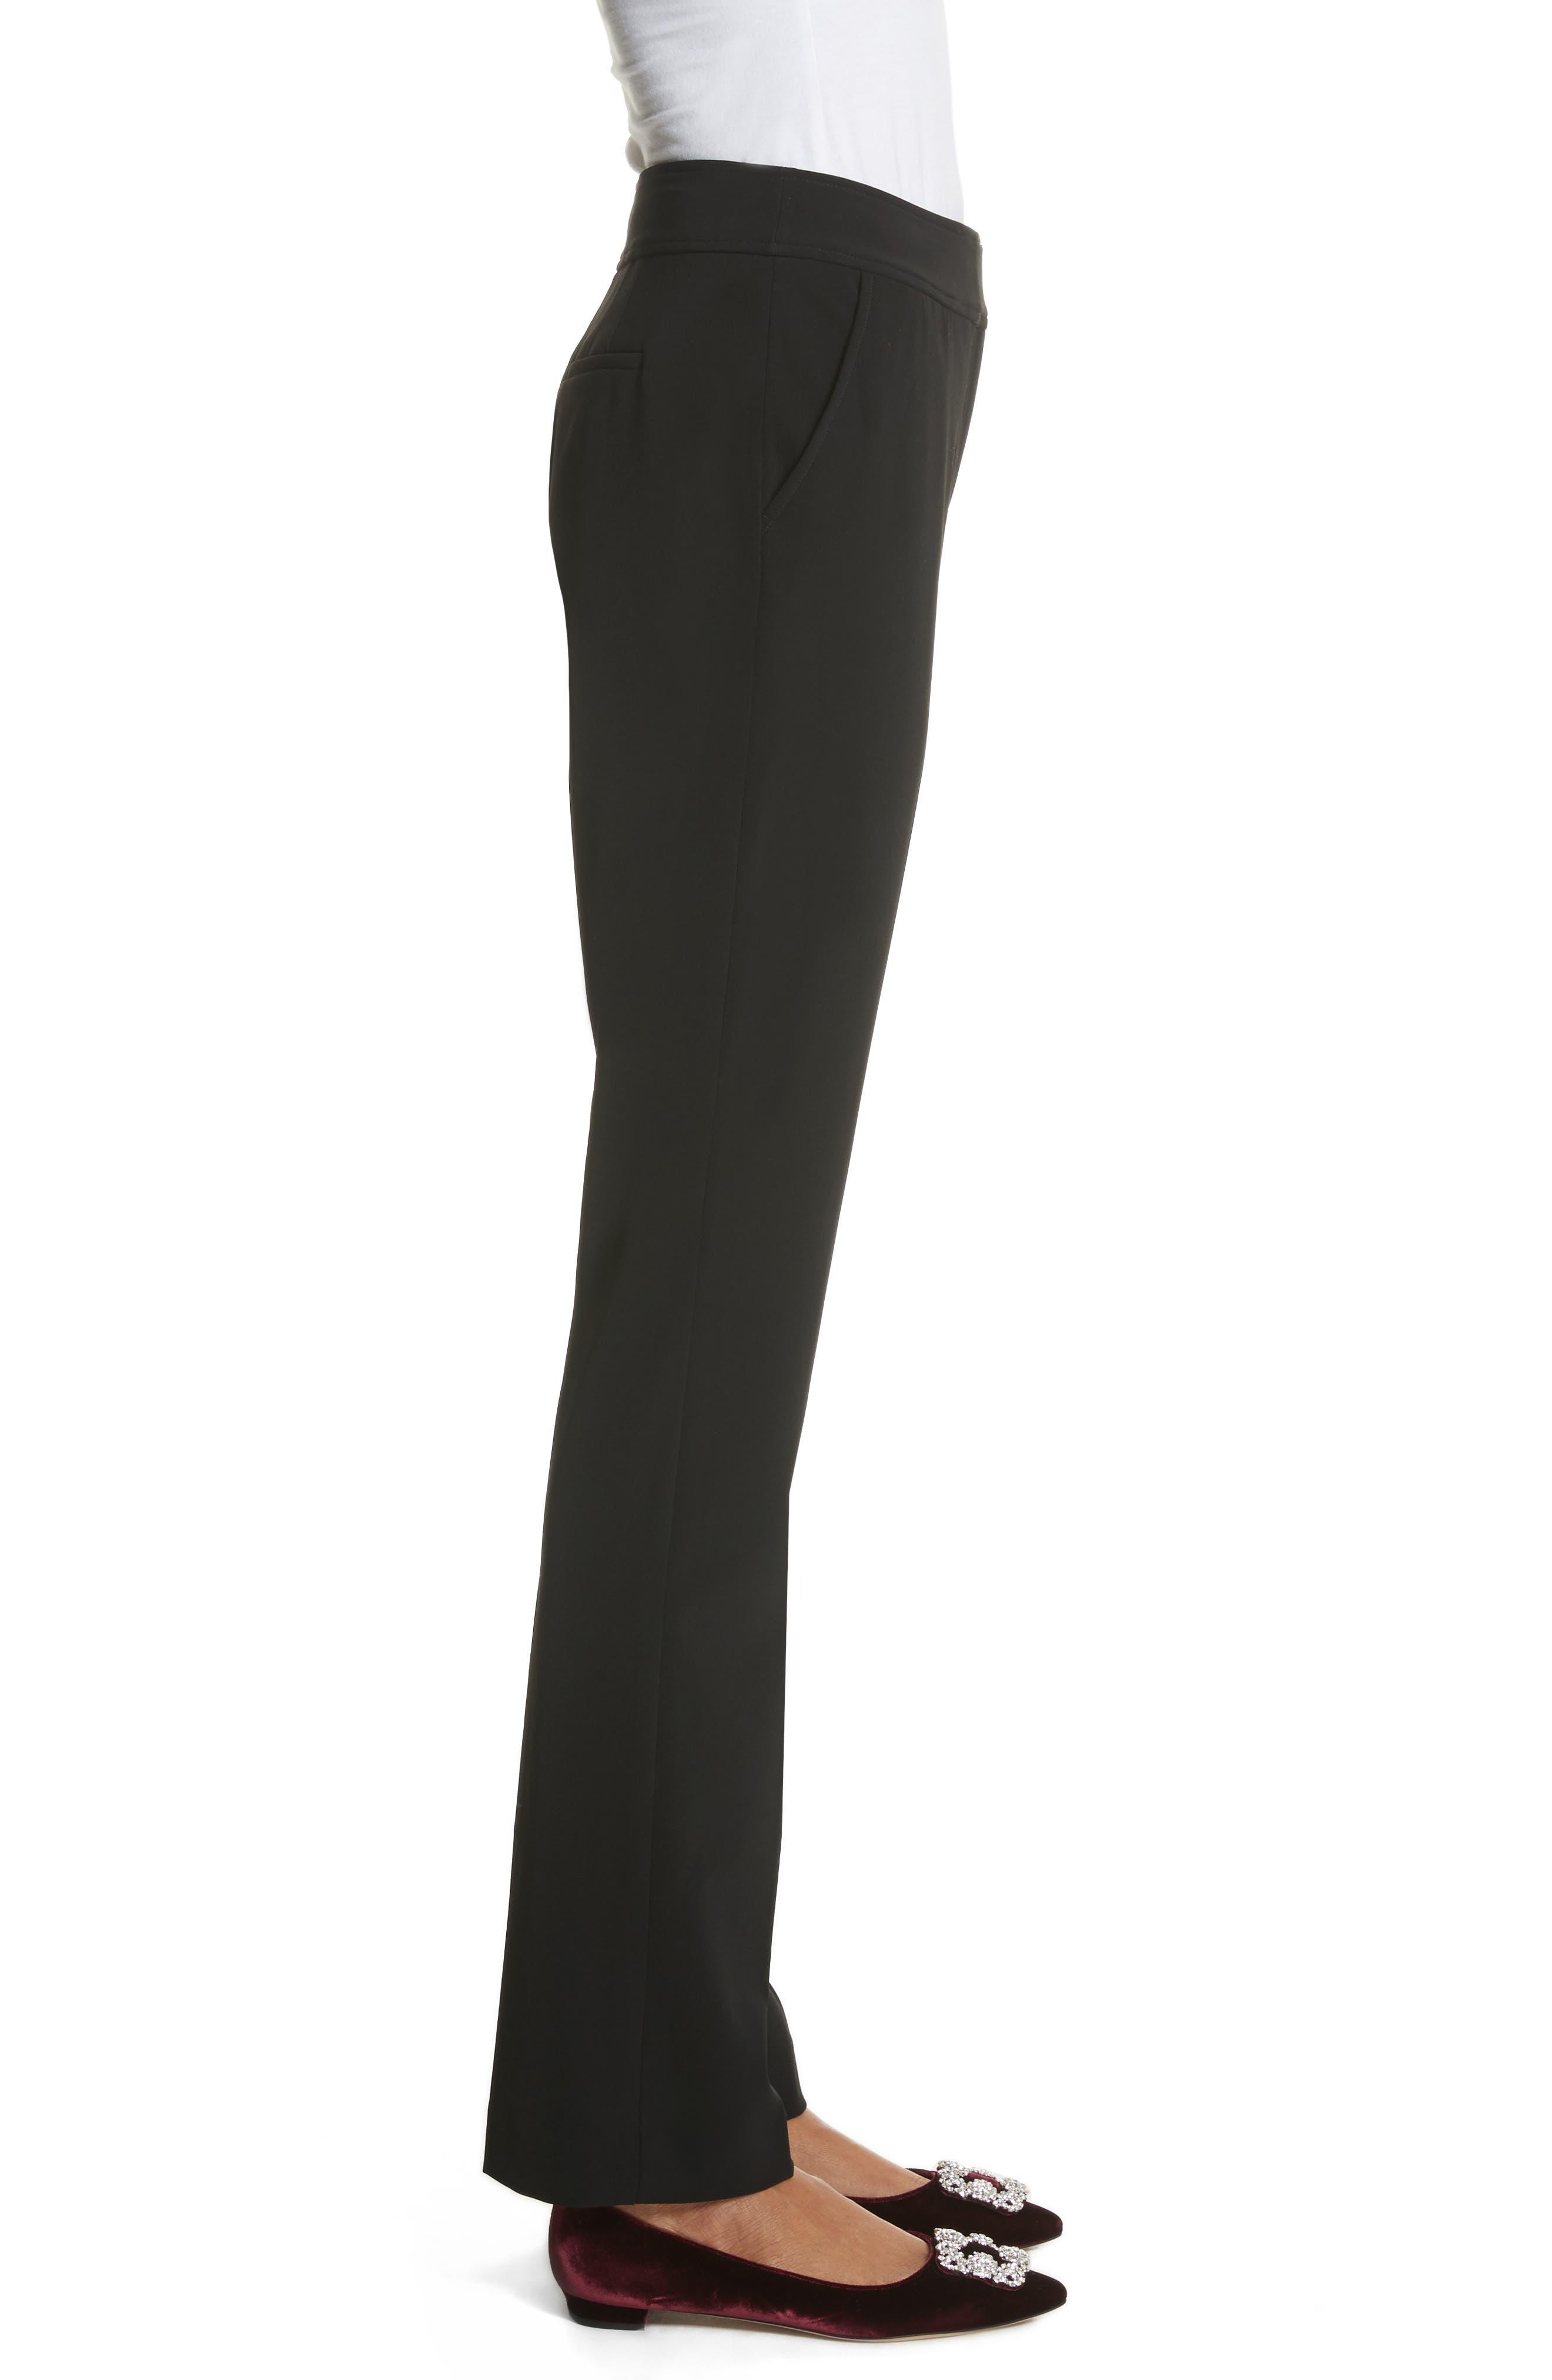 Yulit High Waist Trousers,                             Alternate thumbnail 3, color,                             001